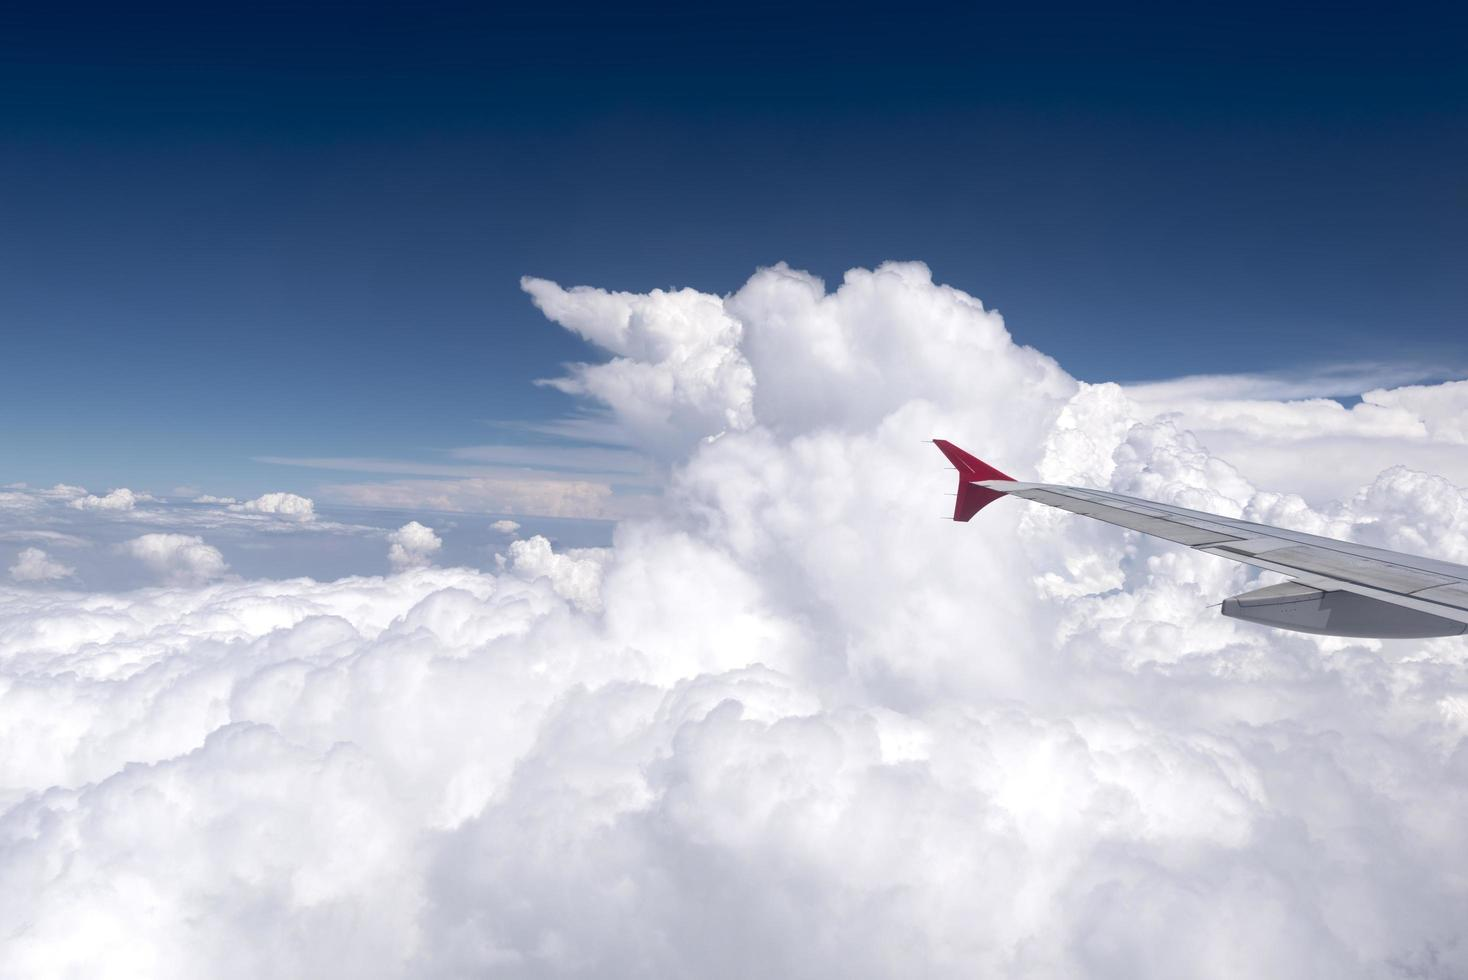 weergave van vliegtuigvleugel vanuit passagiersvenster foto